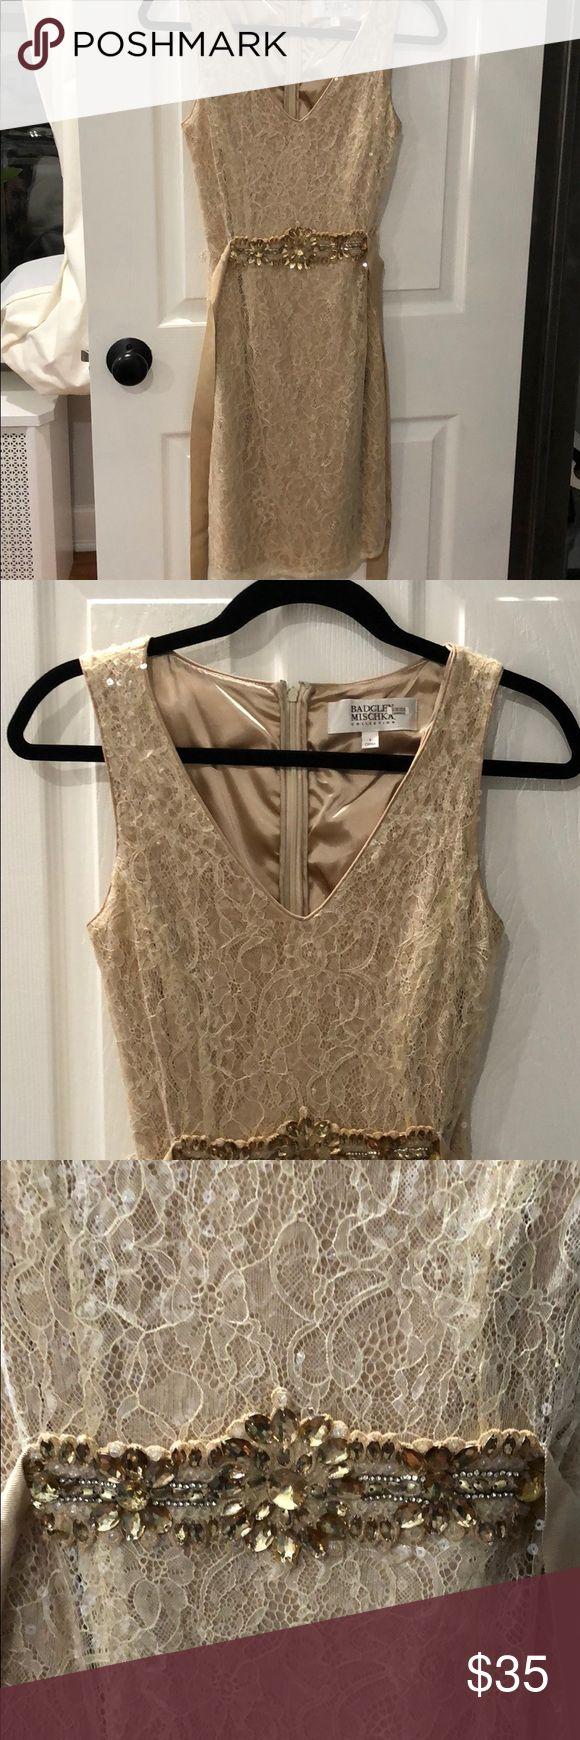 Badgley mischka beige sequin dress with belt. Badgley mischka beige sequin cocktail dress with embellished belt. Size 6. Perfect condition. Badgley Mischka Dresses Midi